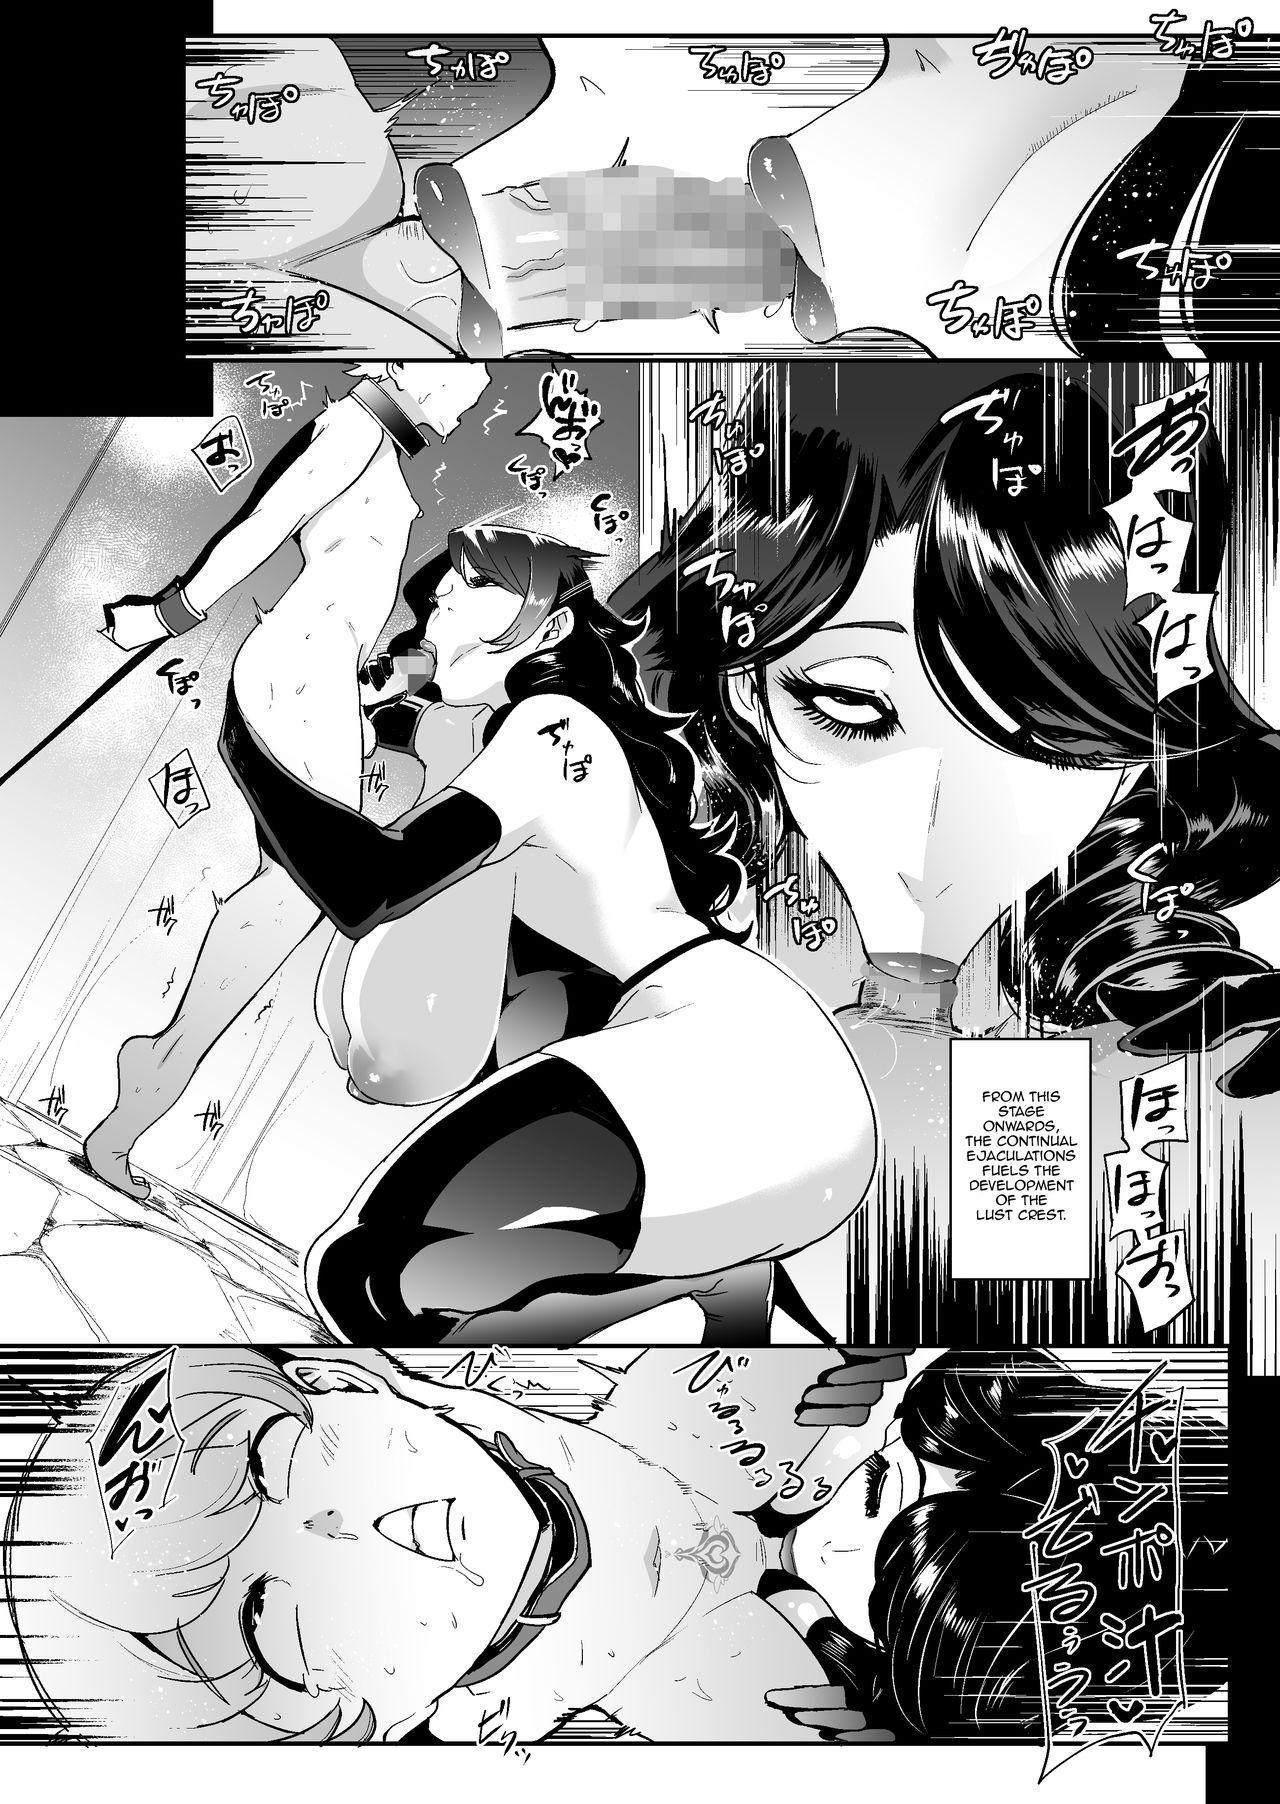 [SOUND MILK (Otochichi)] Mori no Majo - Kyousei Jinkaku Haishutsu Shasei - | Forest Witches - Forced Personality Ejection Ejaculation - [English] [Jormangander] 24